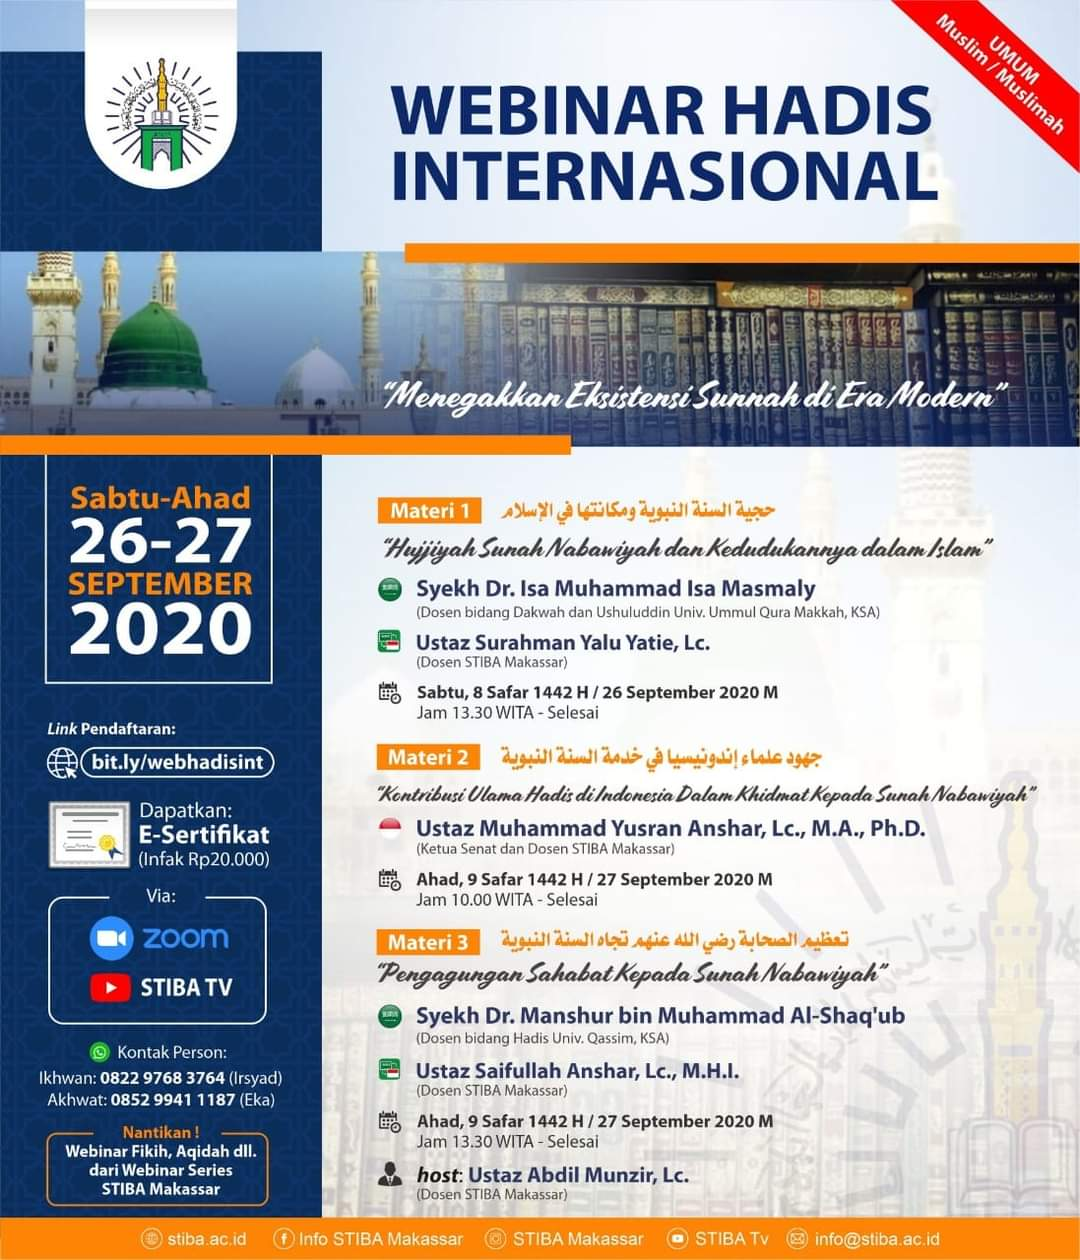 Webinar Hadis Internasional